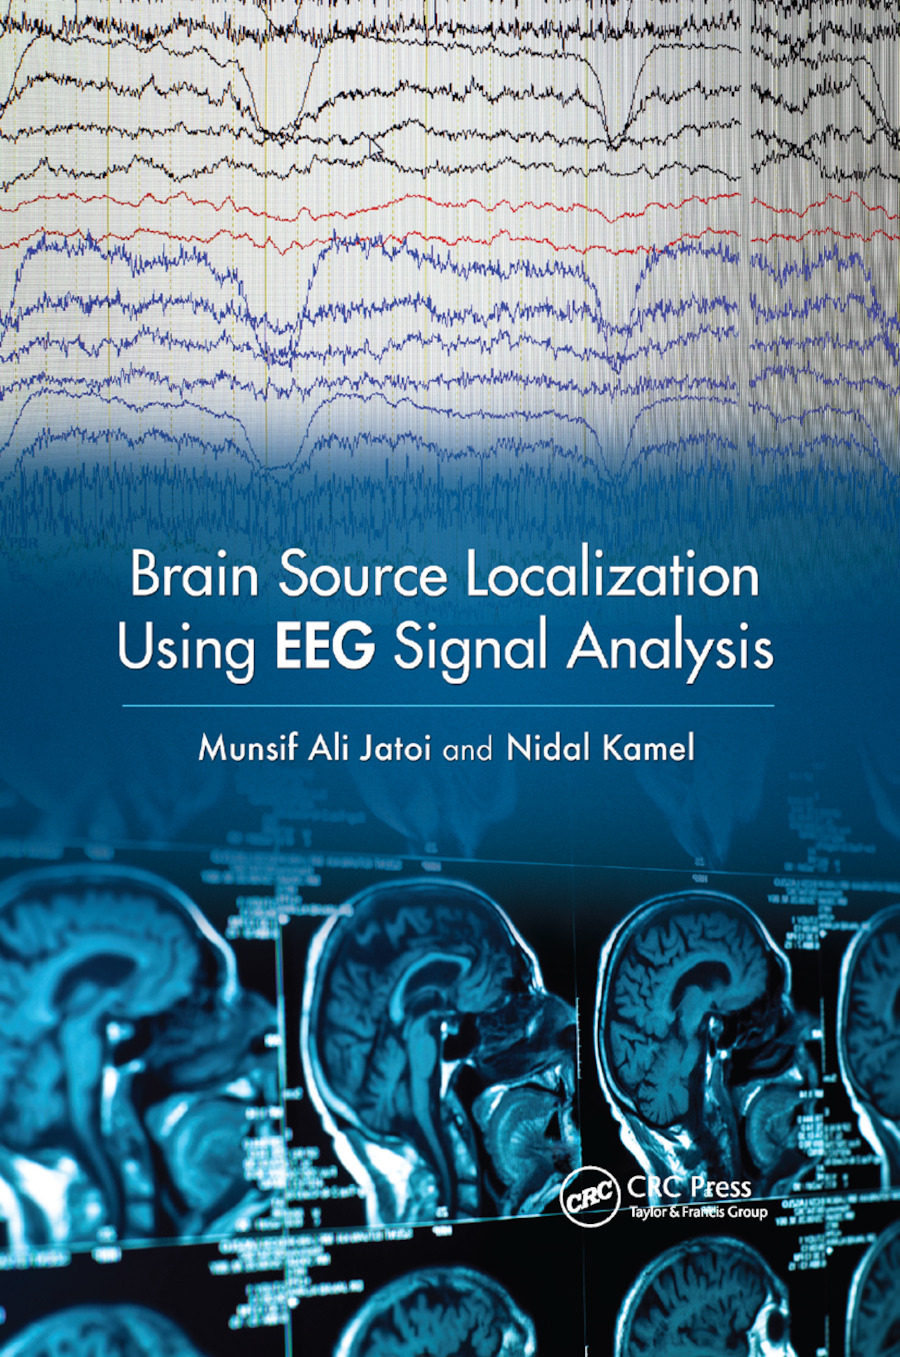 Brain Source Localization Using EEG Signal Analysis book cover